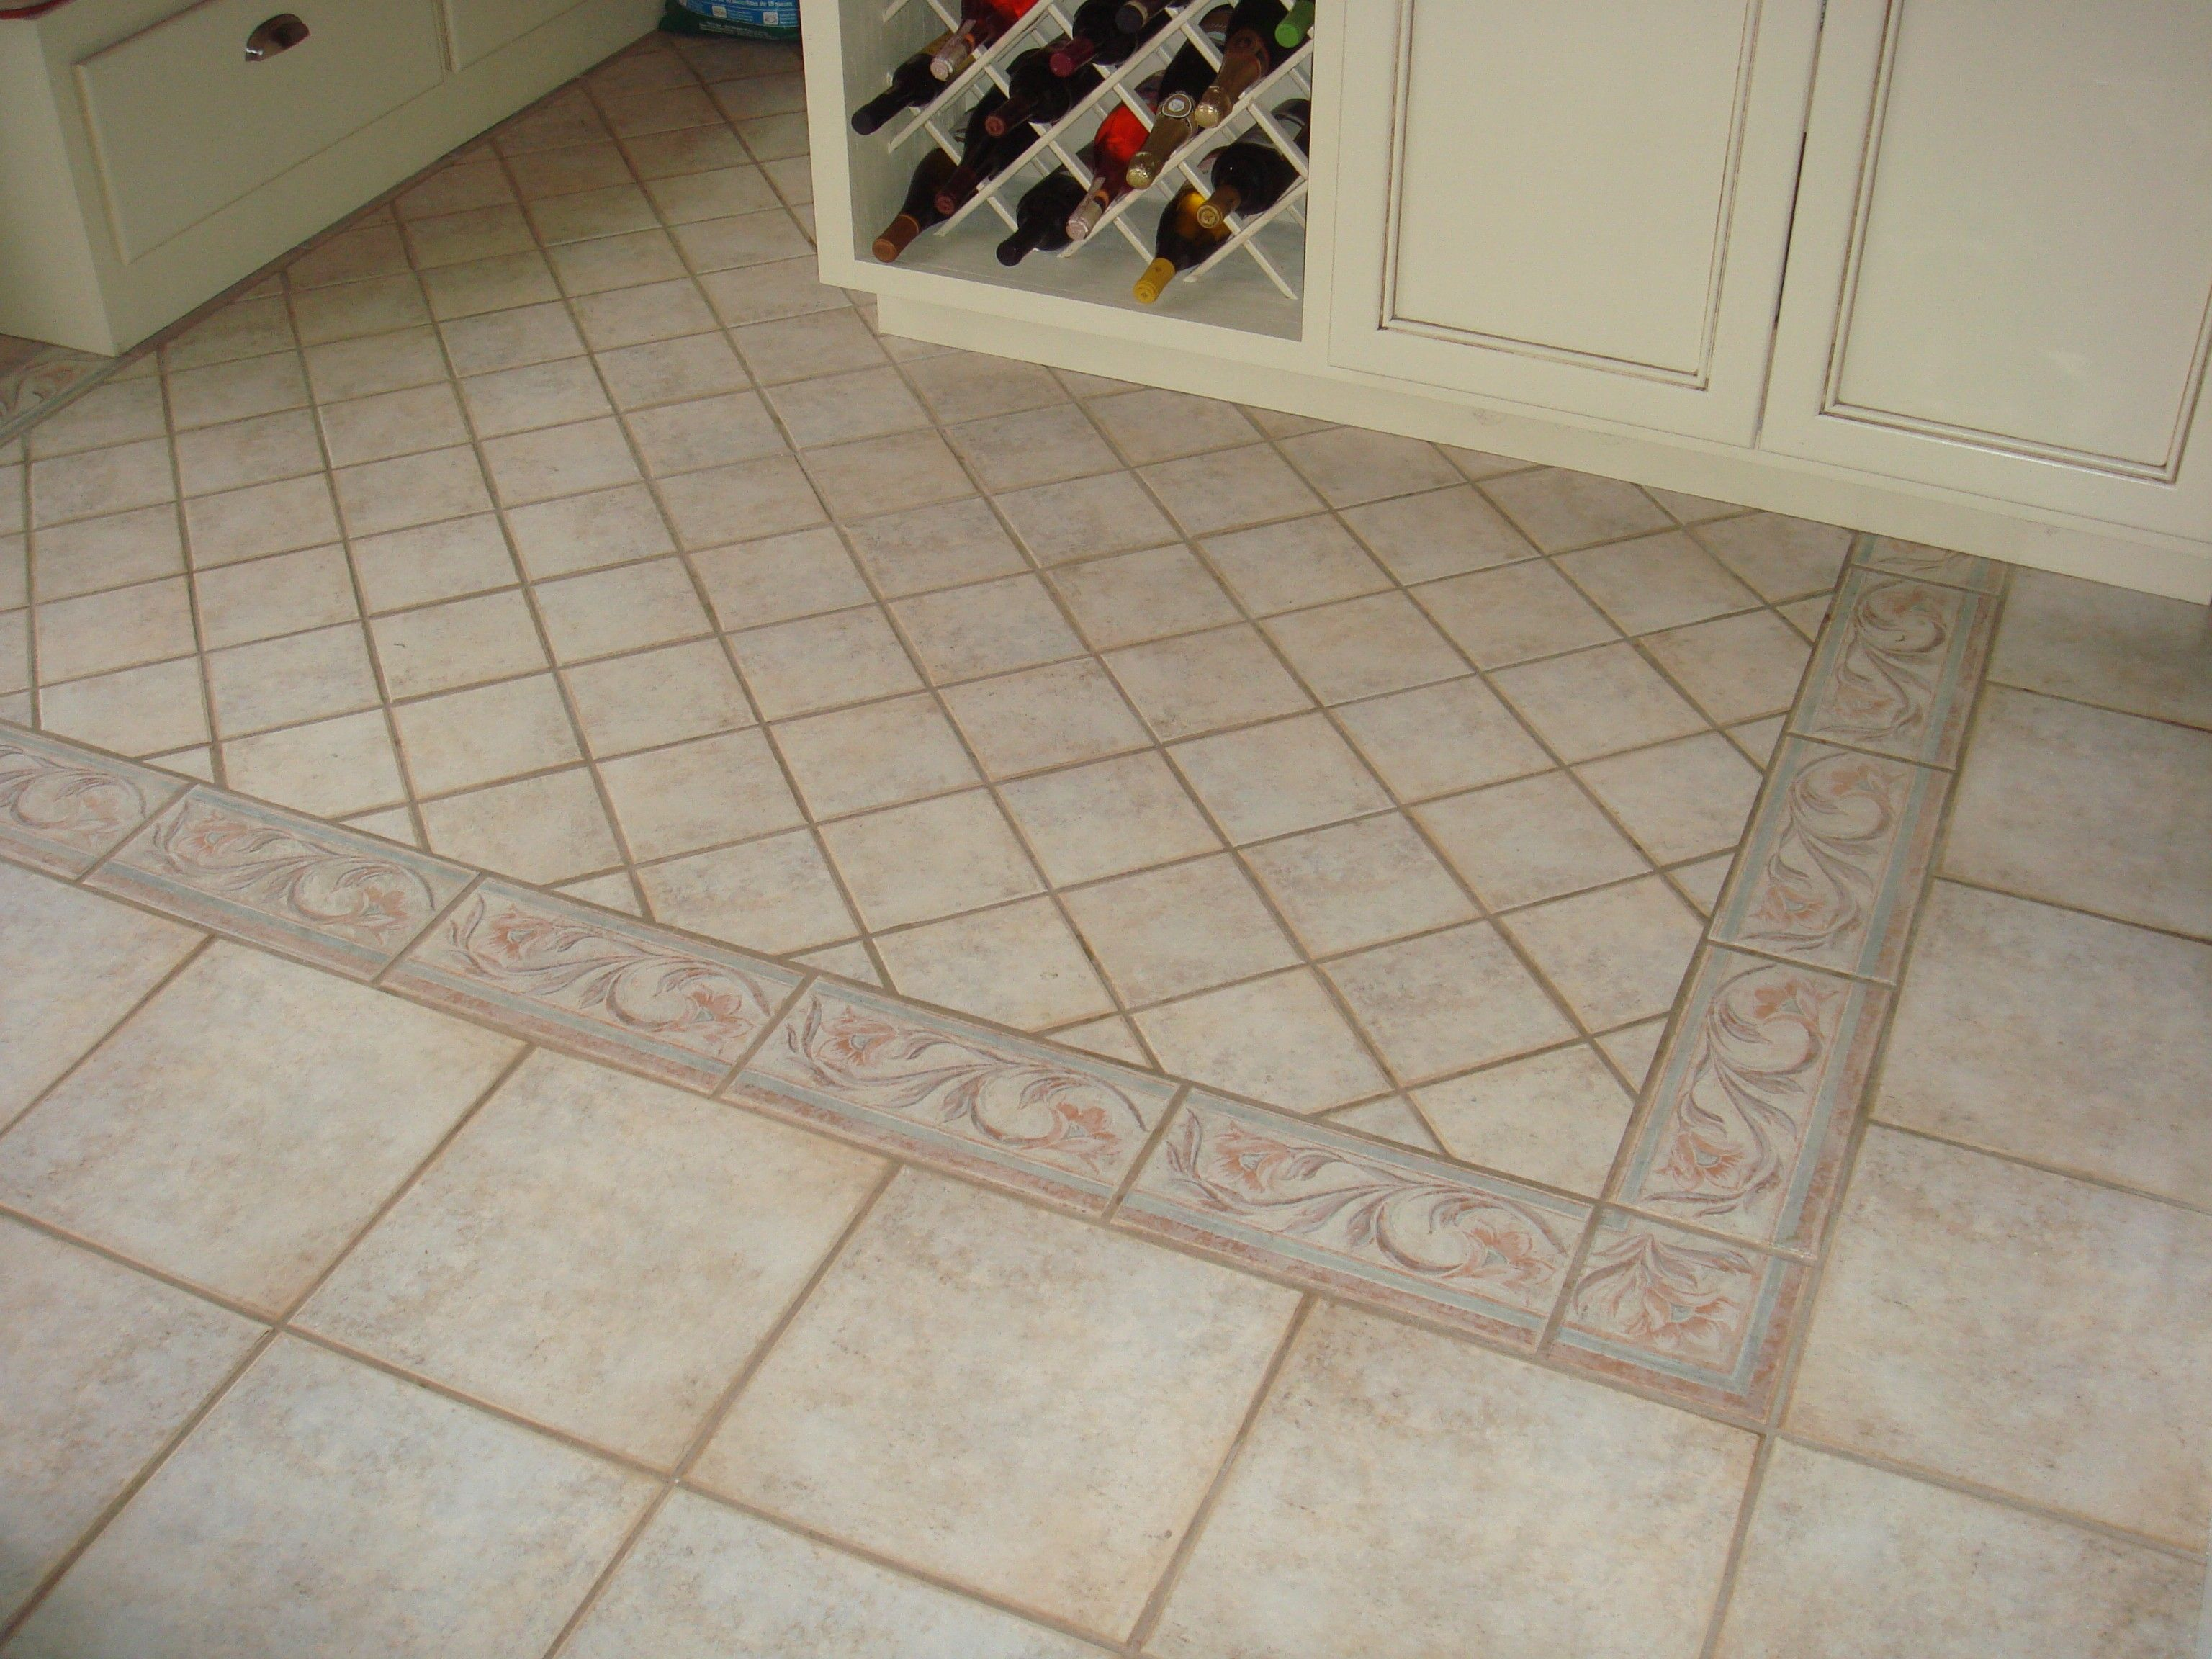 Charming Ceramic Tile Floor Designs Ideas Pictures - Best ...